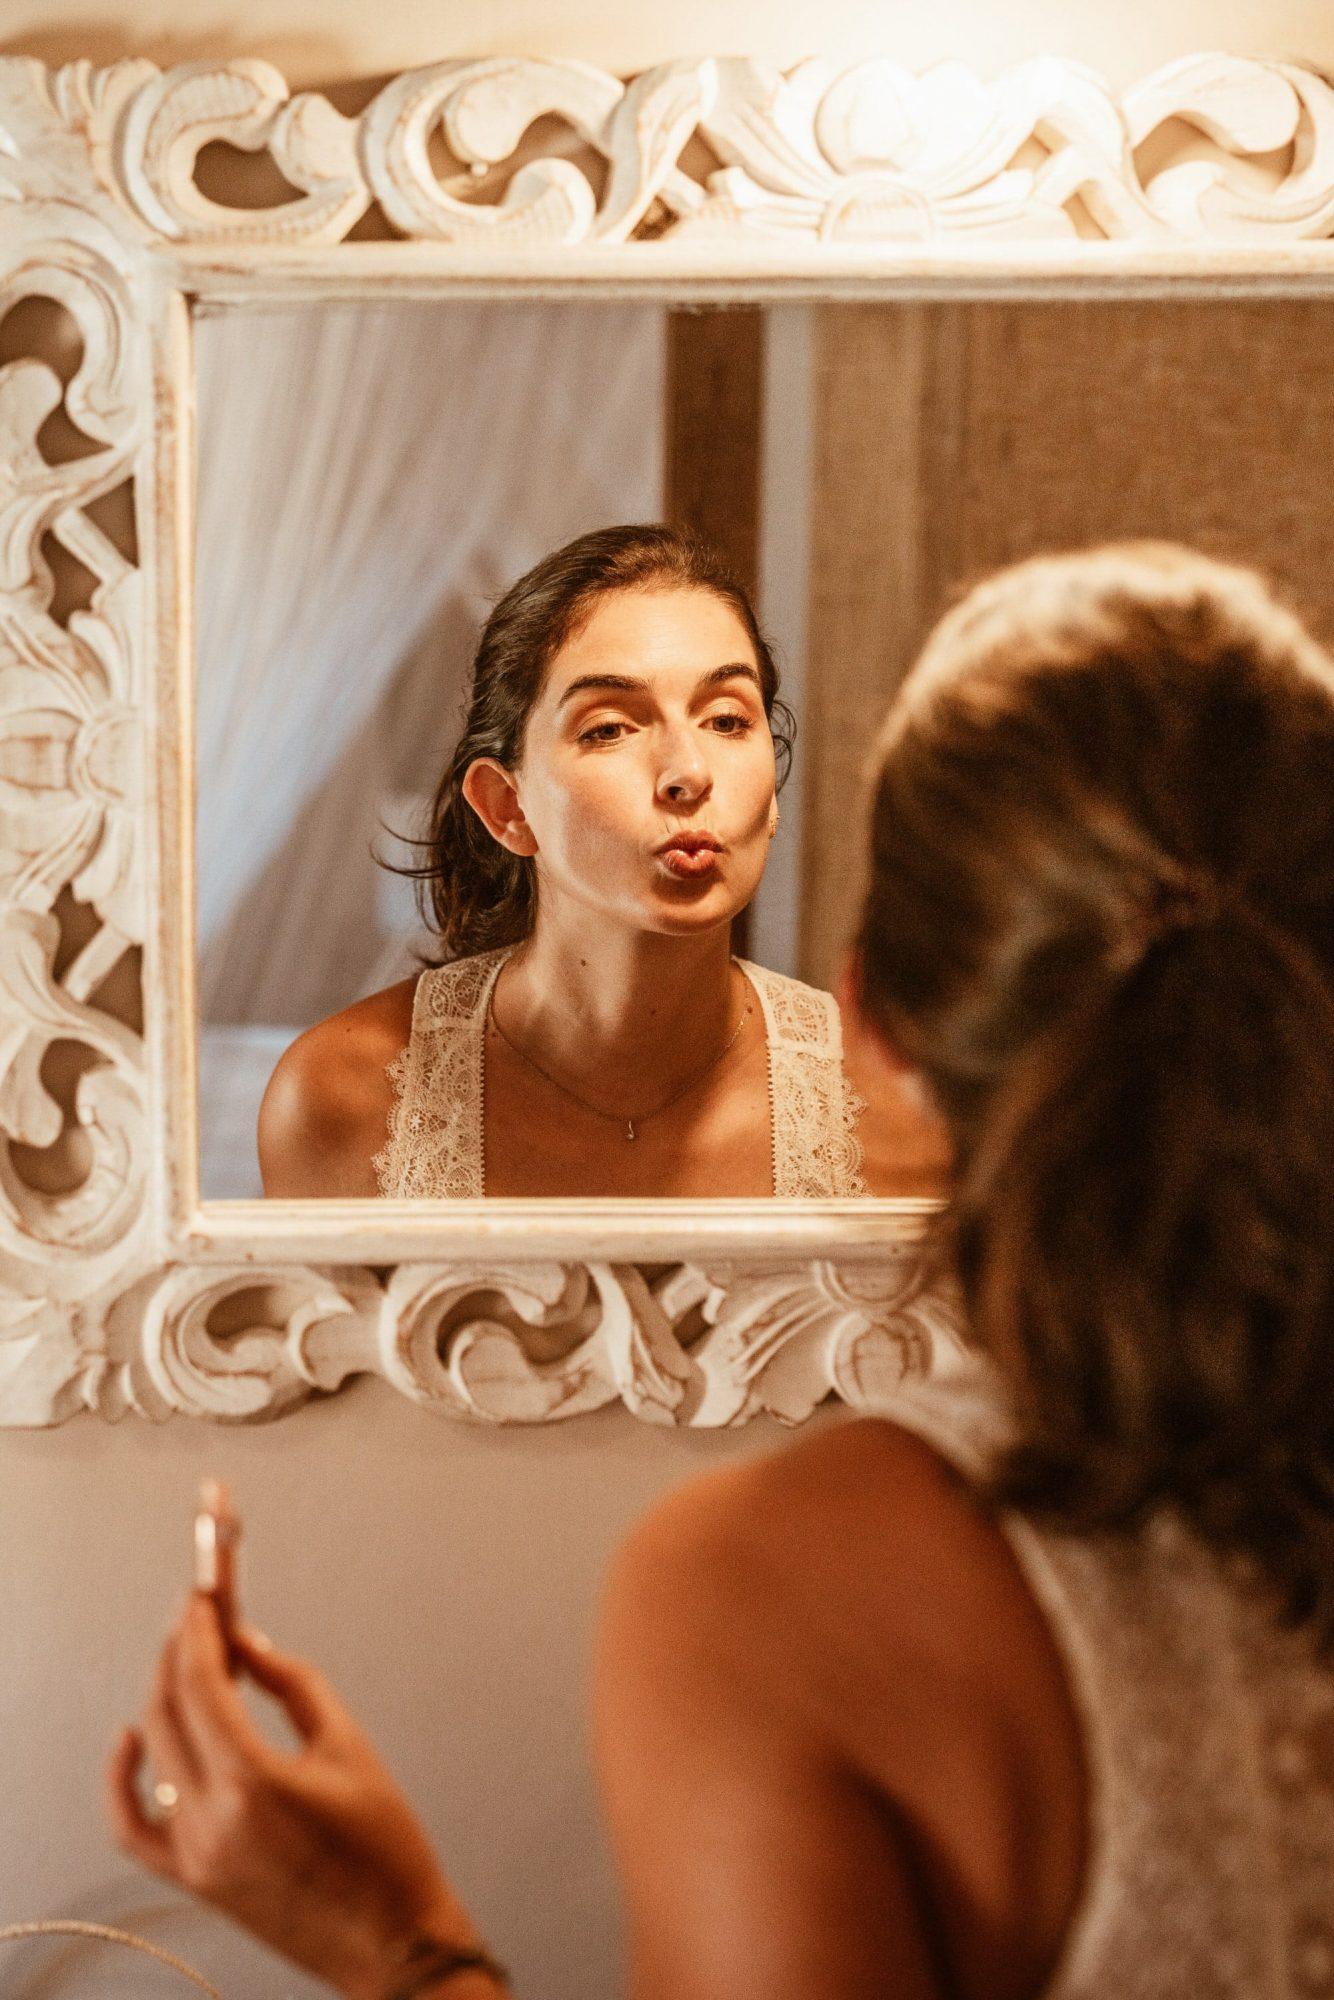 intimate photo shoot by Arara Pintada